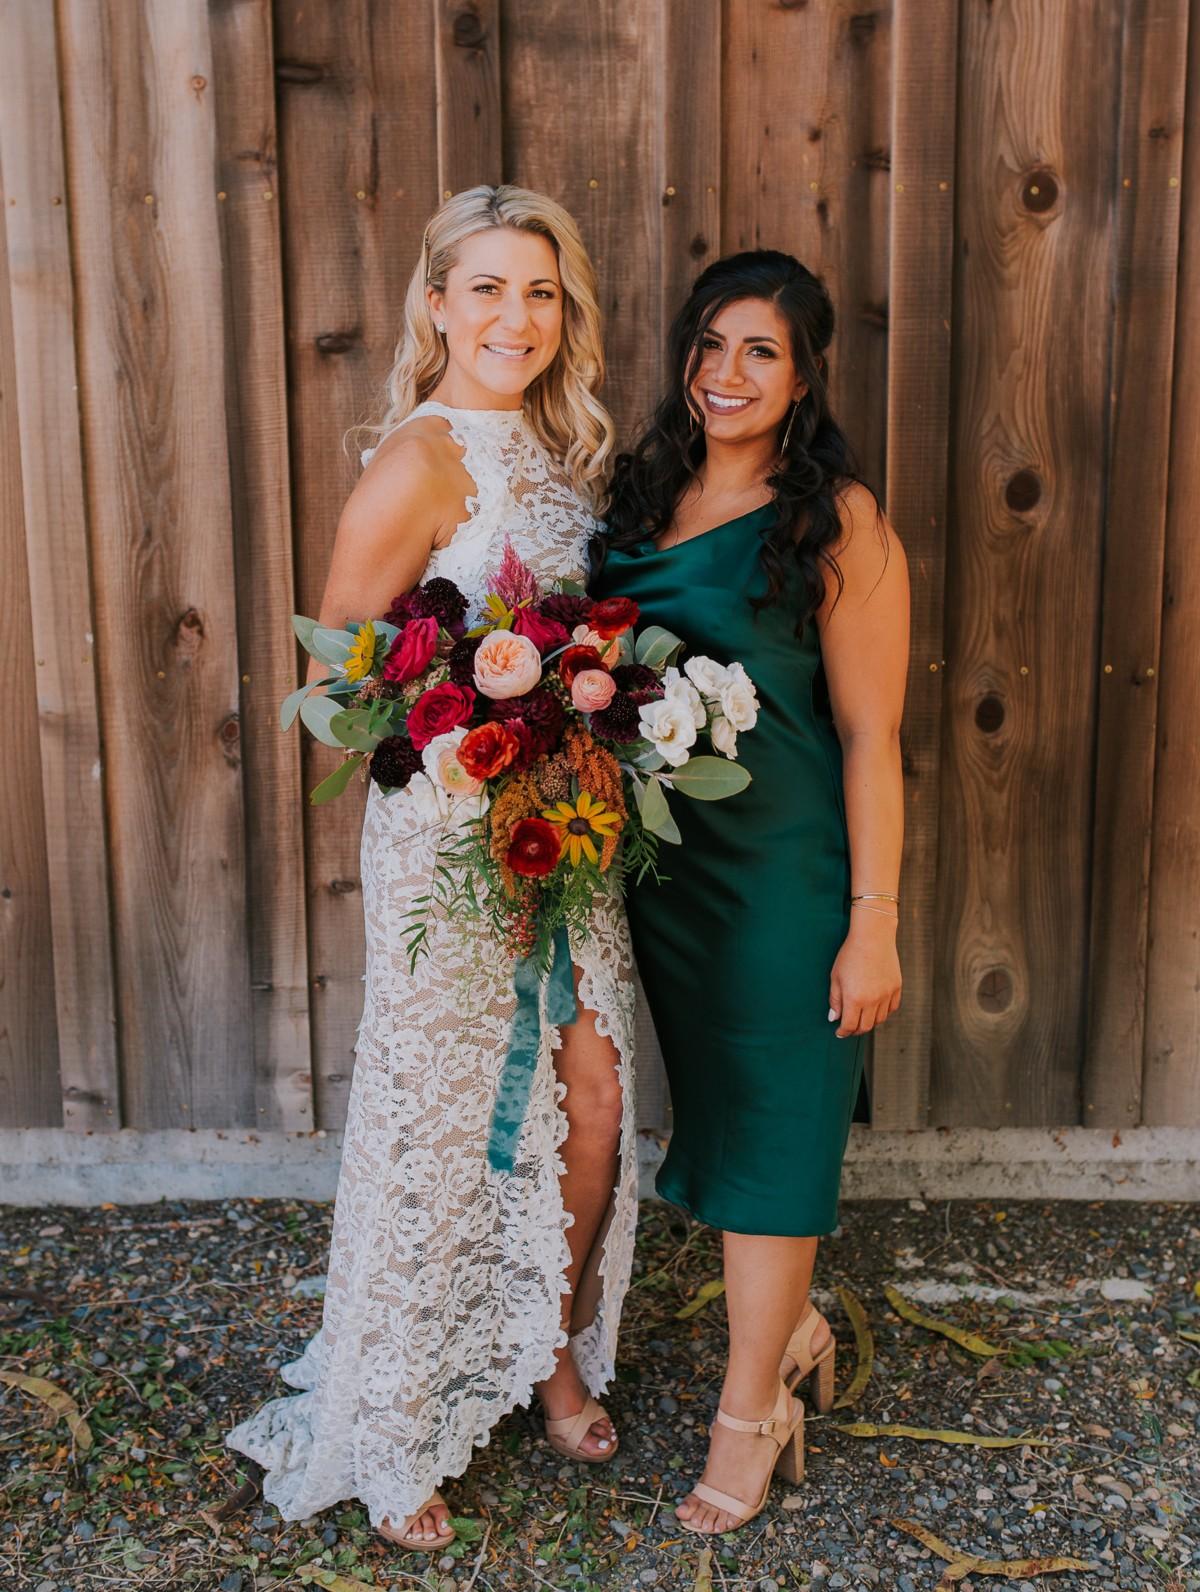 Nancy Rice Artistry - Lake Tahoe wedding hair & makeup - bride with bridesmaid